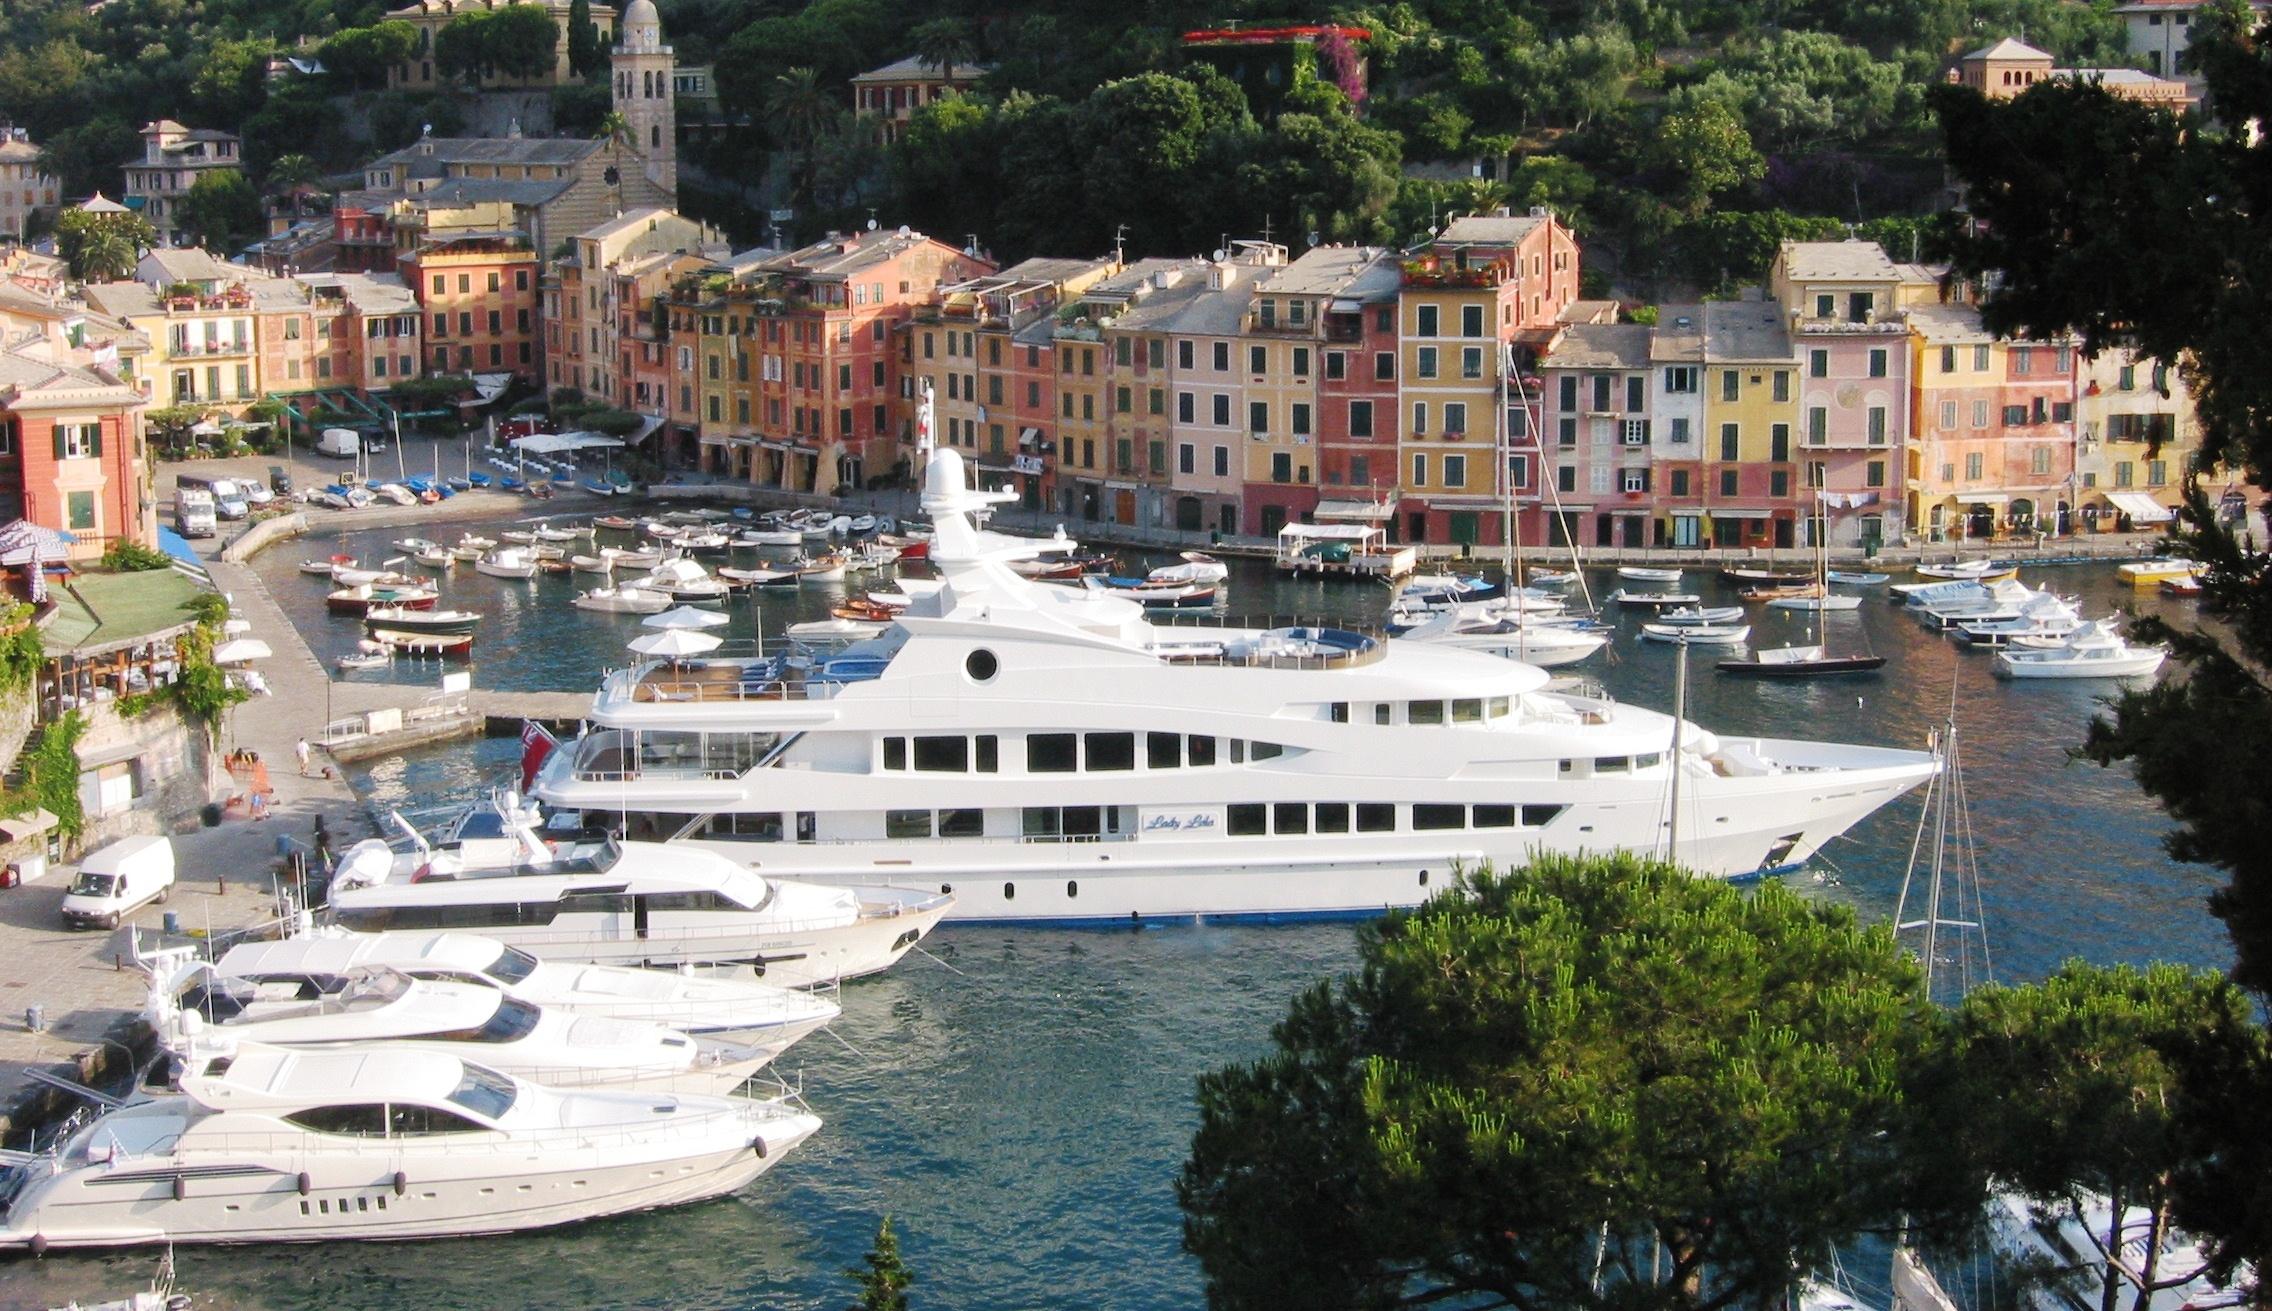 Superyachts Including Lady Lola In Portofino Harbour In